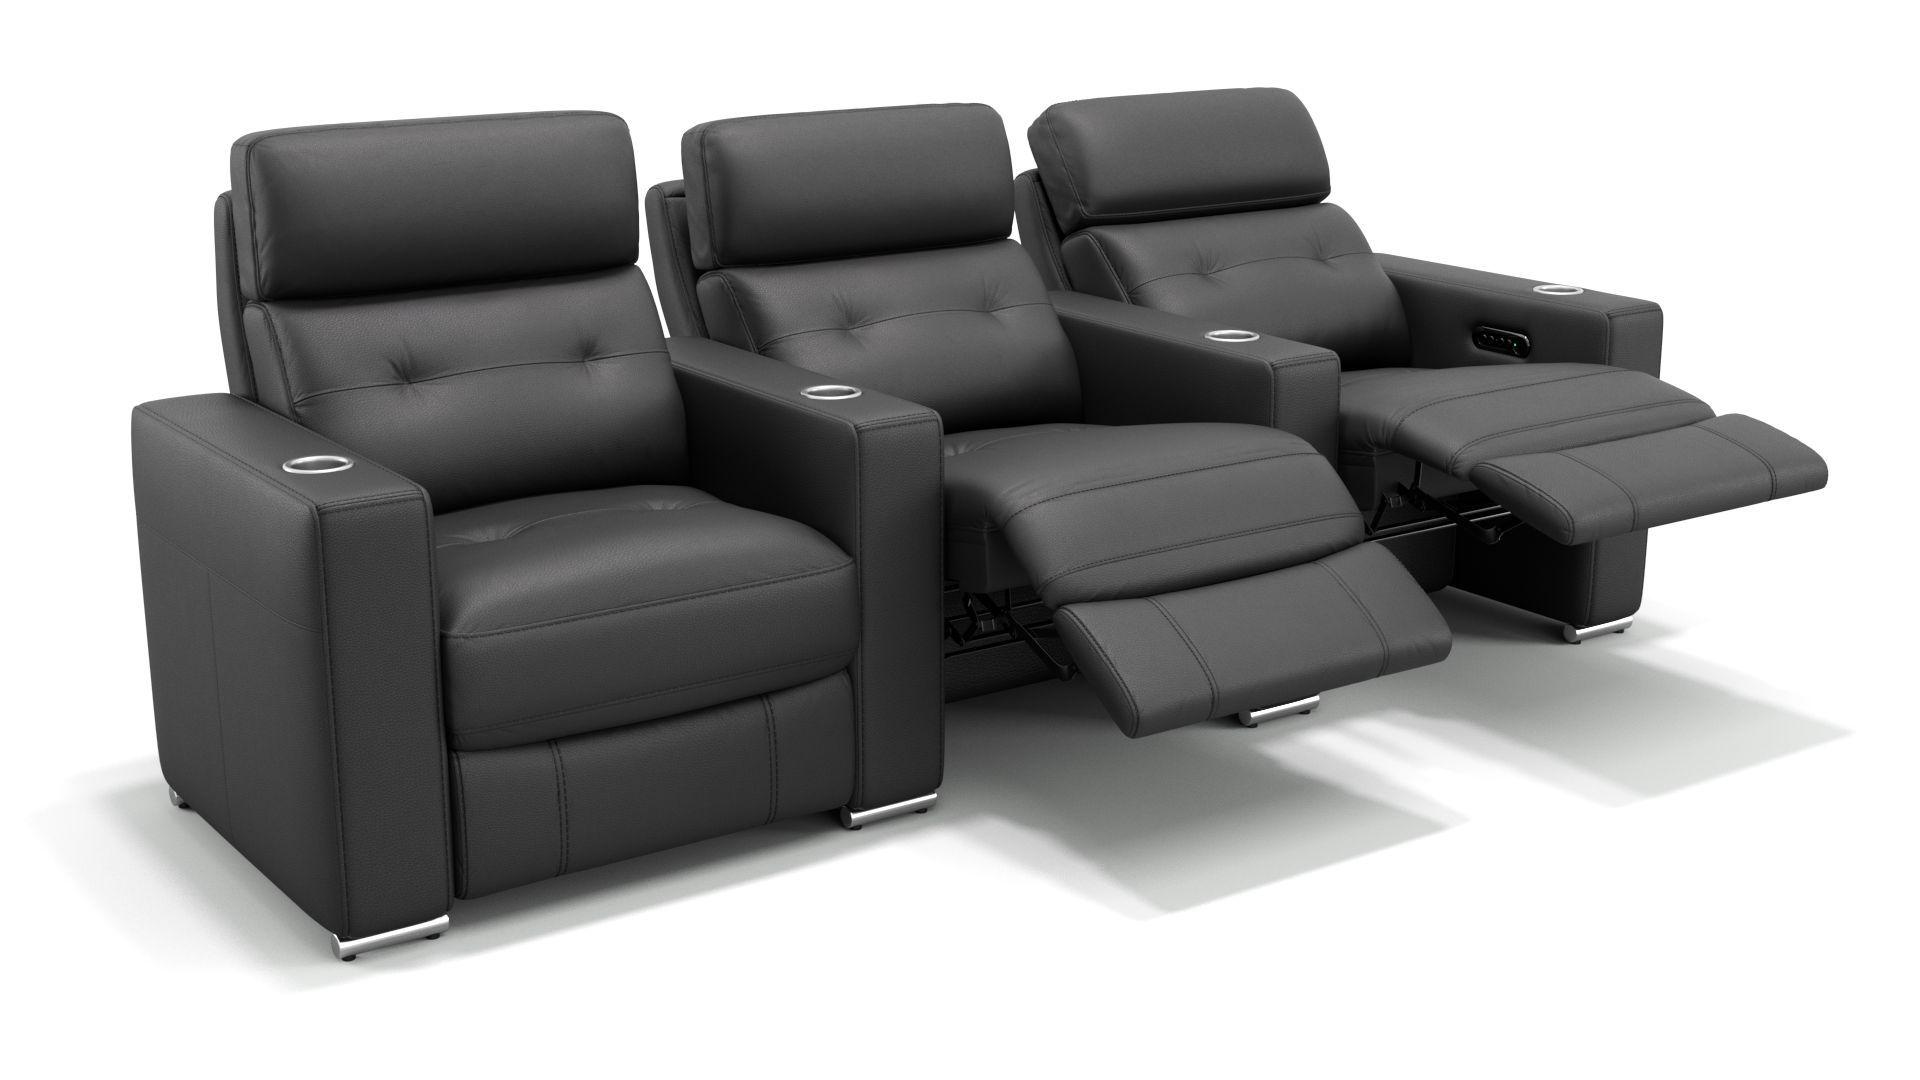 Full Size of Heimkino Sofa Leder Test Kaufen Elektrisch Xora Couch 3 Sitzer Elektrischer Relaxfunktion Pin By Marga Whigham On Entertainment Room Home Theater Große Kissen Sofa Heimkino Sofa